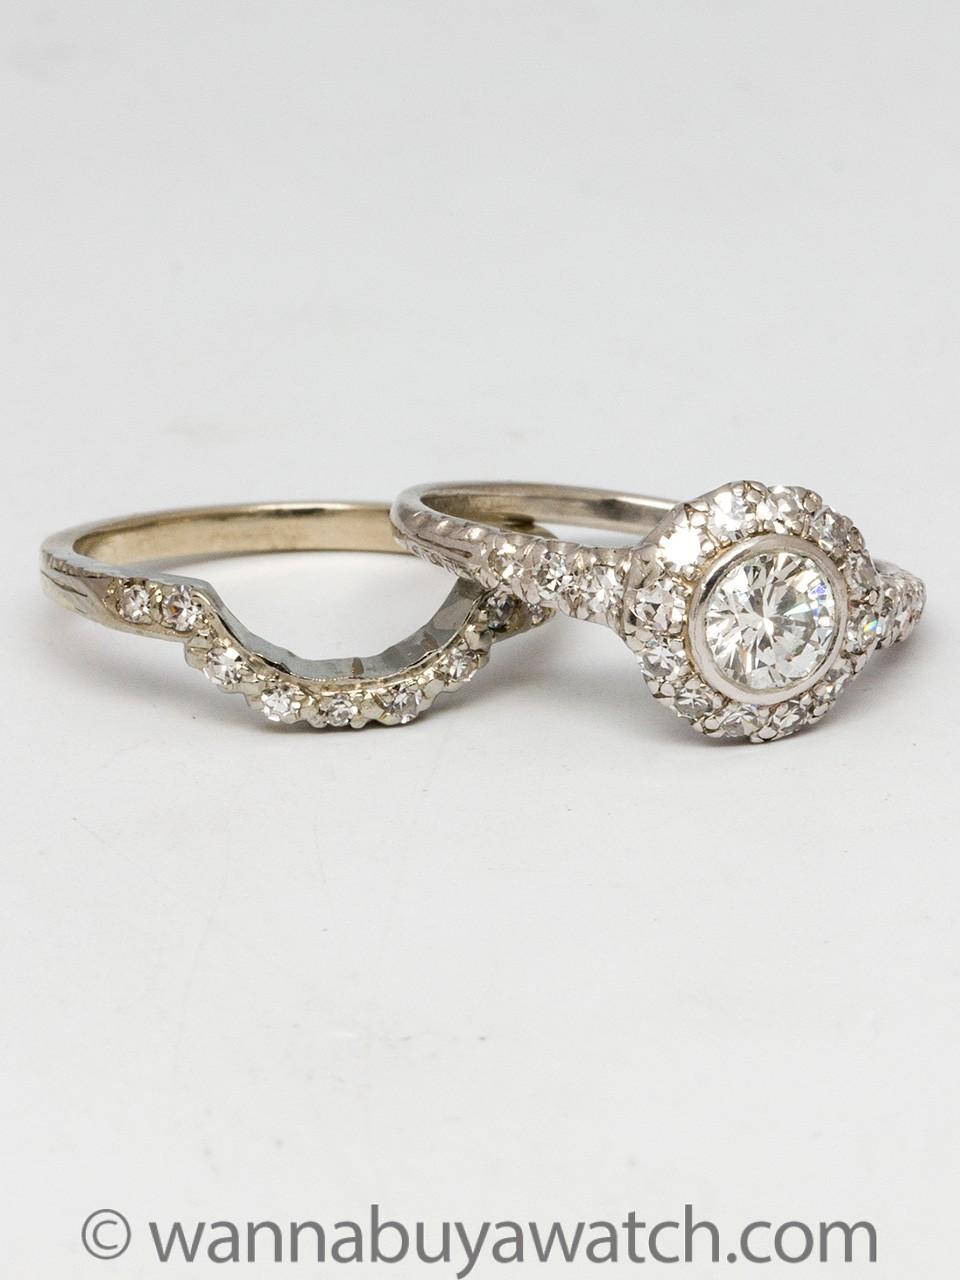 Vintage Platinum Engagement Ring and Band Wedding Set 0.51 Carat D-VS2